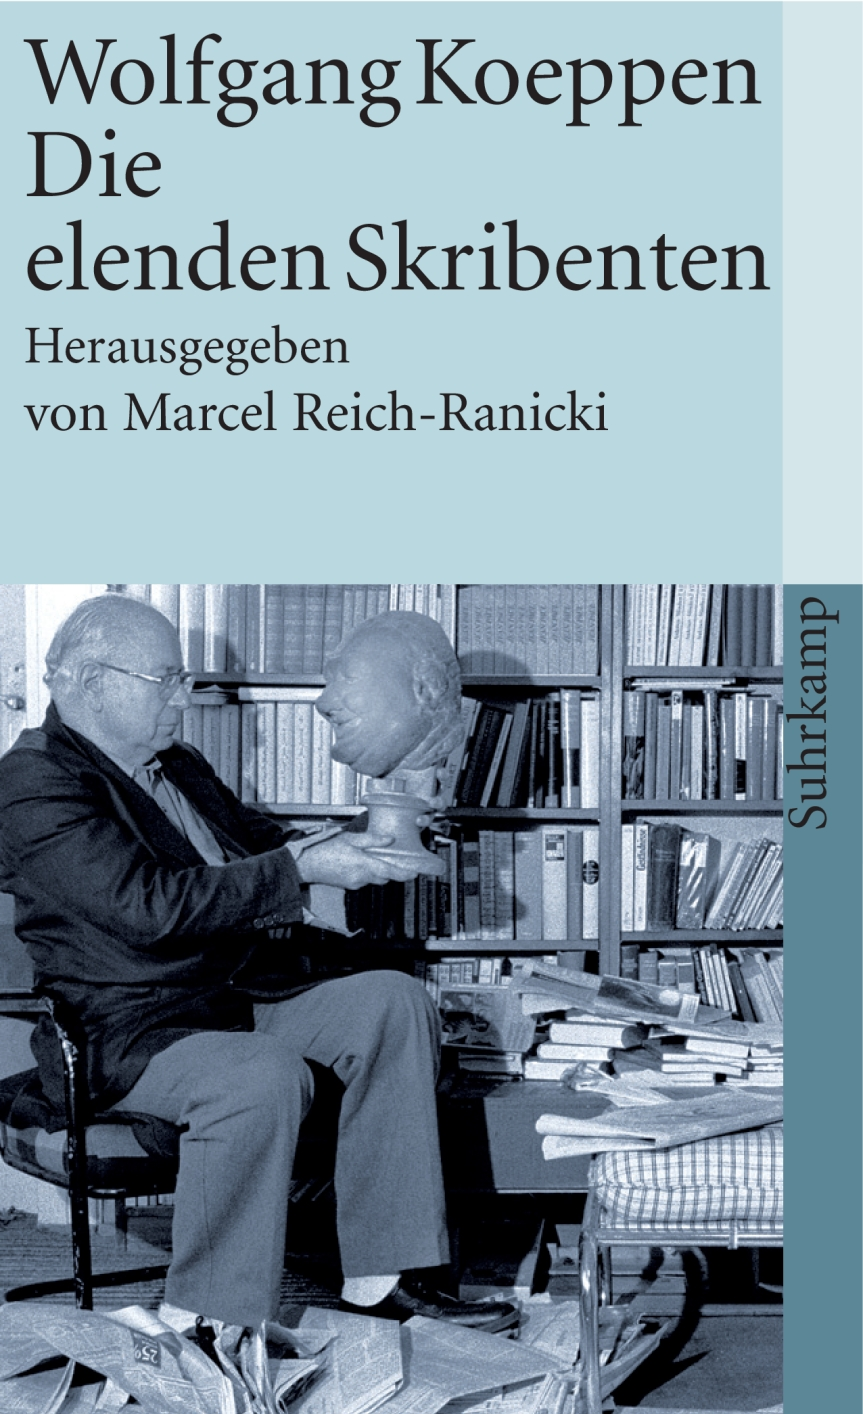 Wolfgang Koeppen: Die elenden Skribenten.Aufsätze